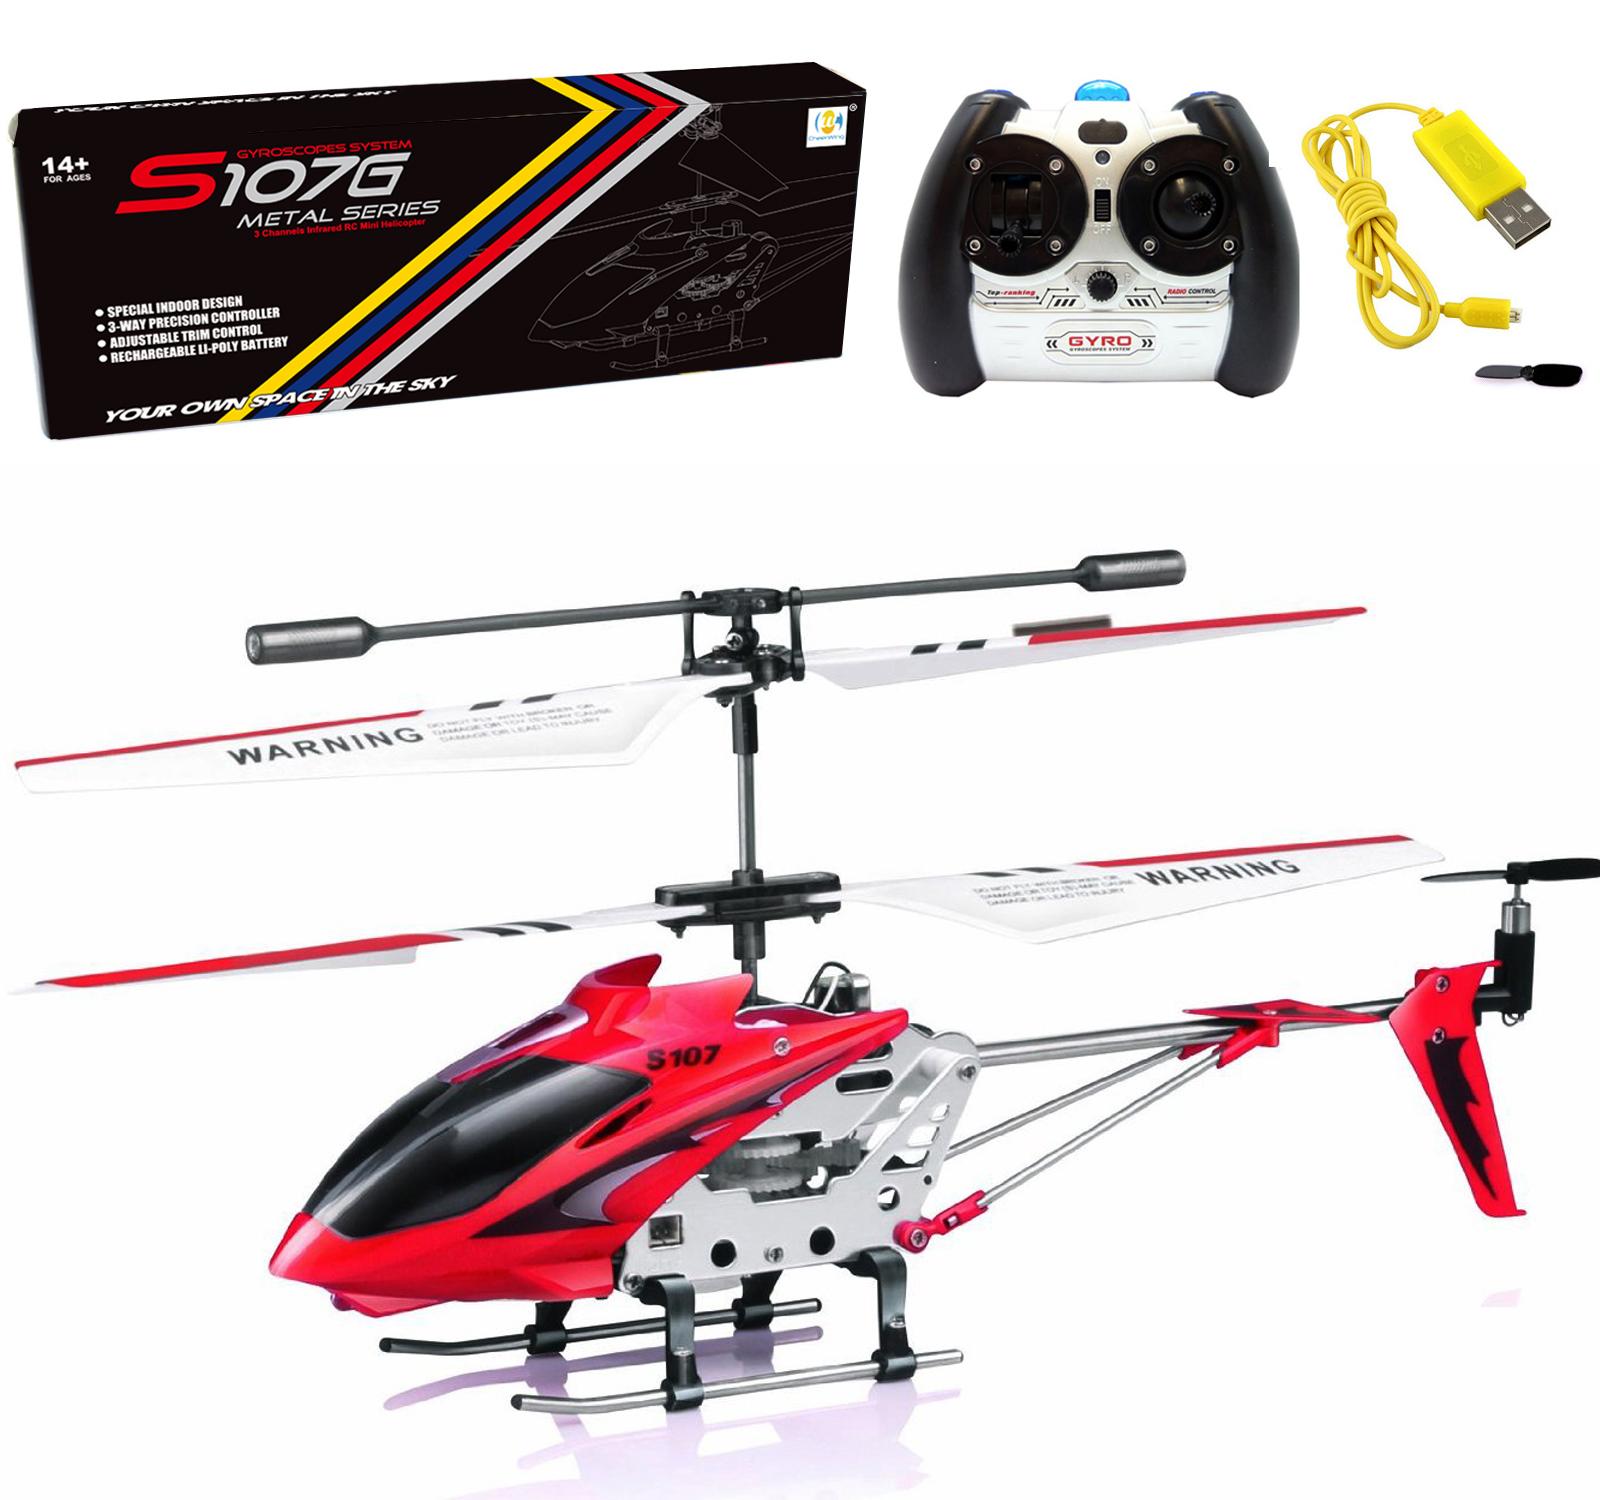 syma s107 s107g phantom 3ch mini metal remote control rc helicopter